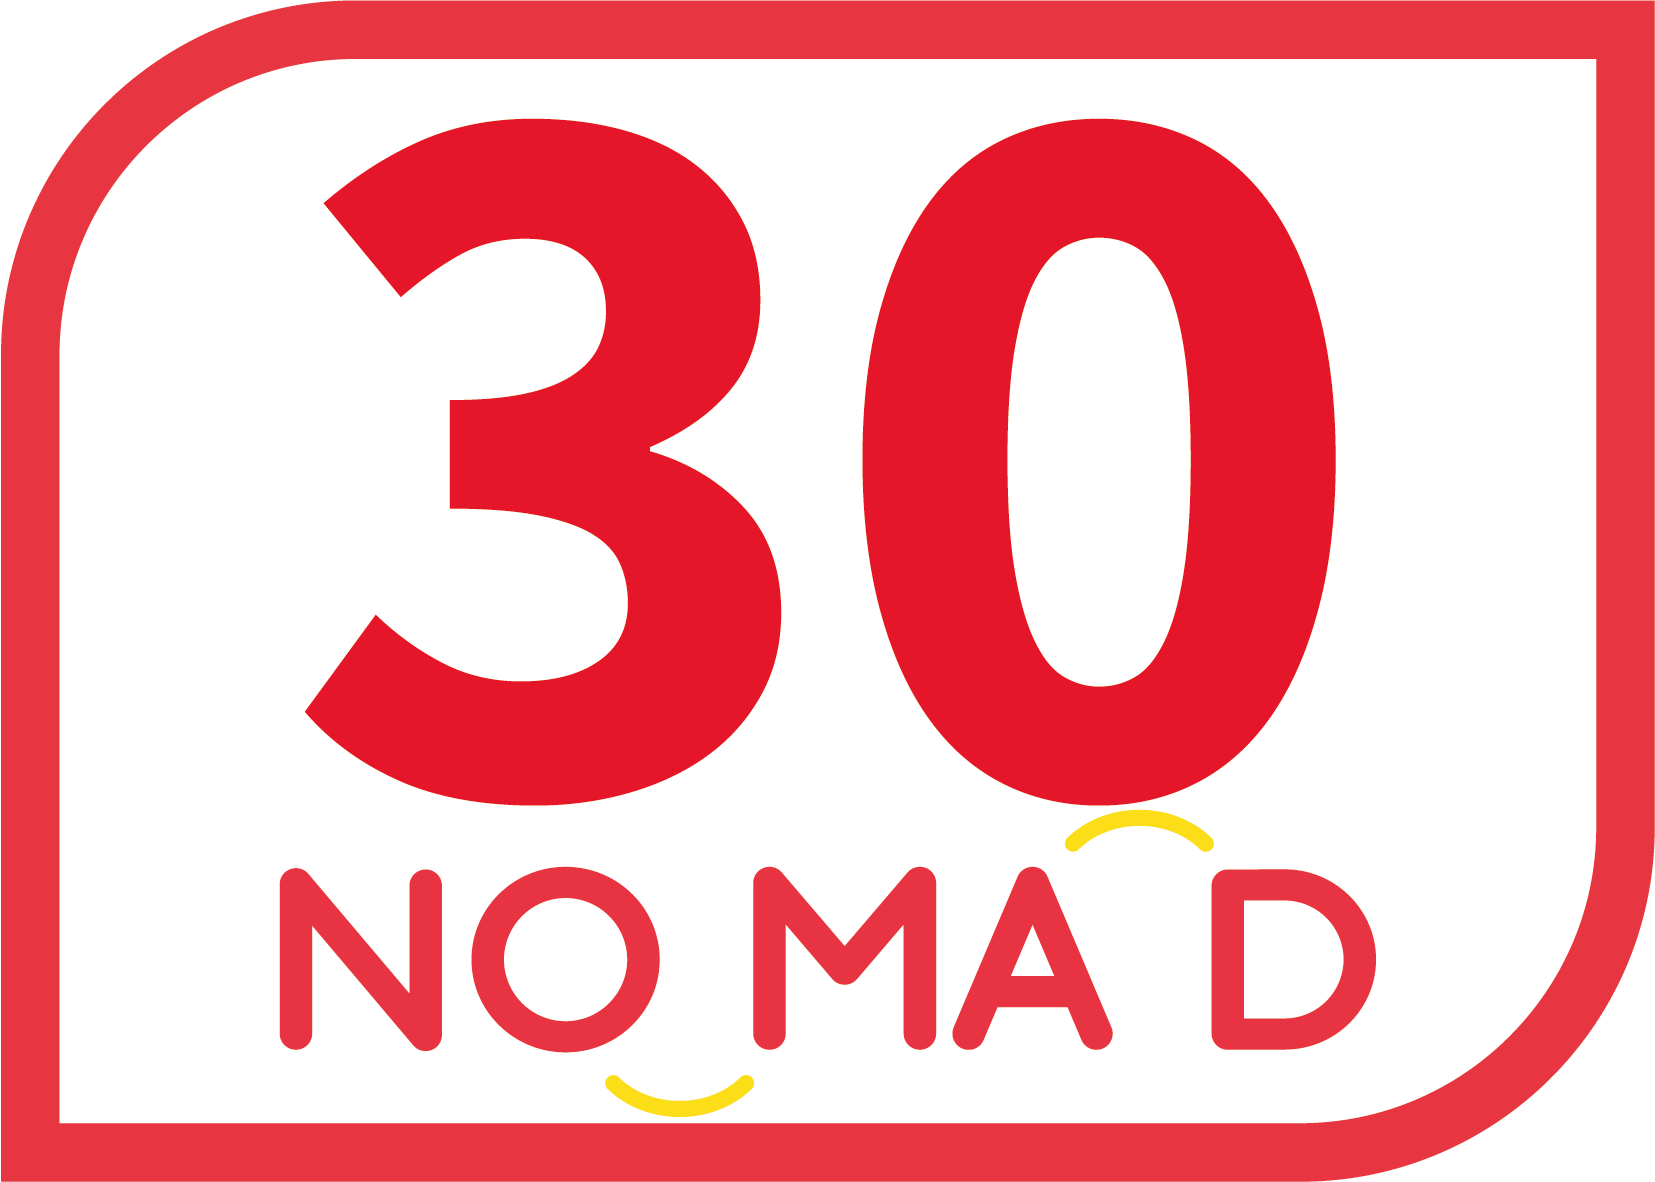 Nomad 30